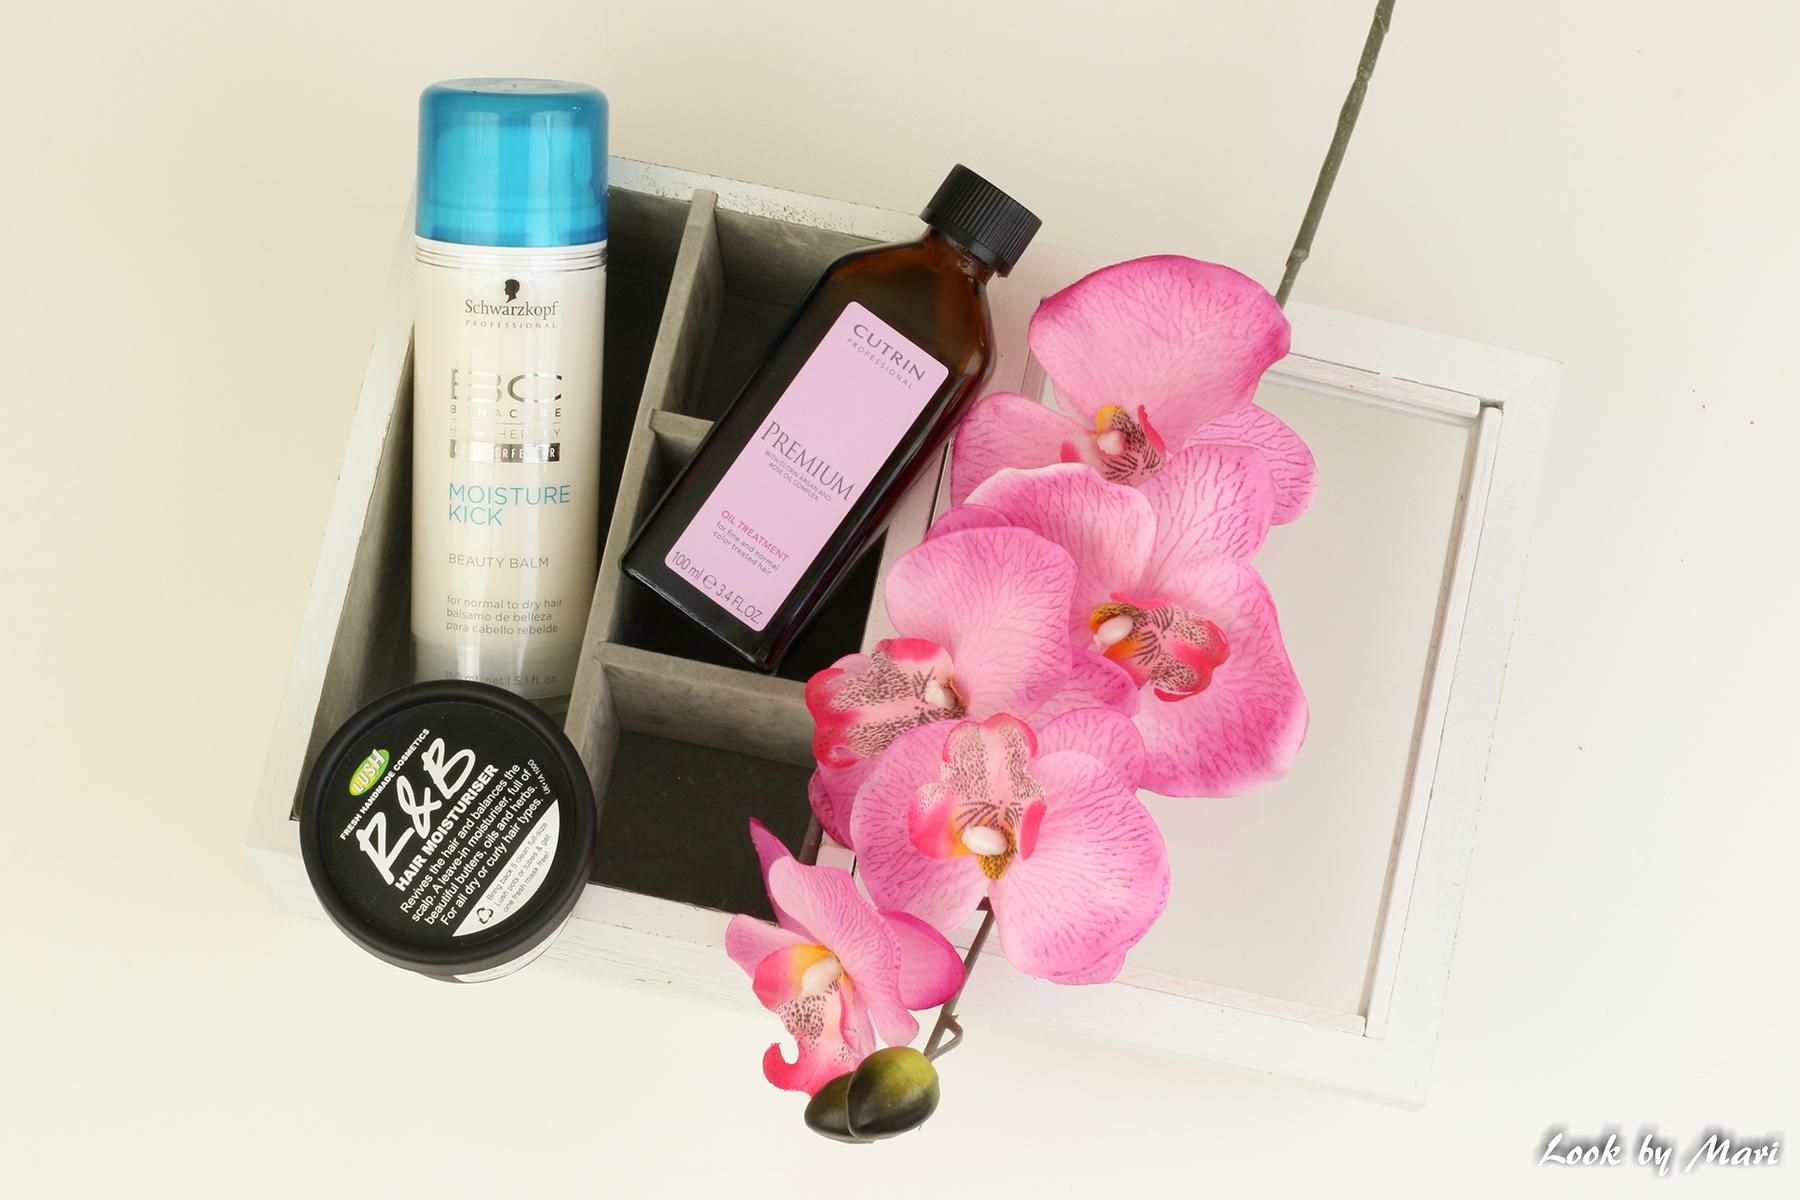 4 scharzkopf moisture kick beauty balm kokemuksia review